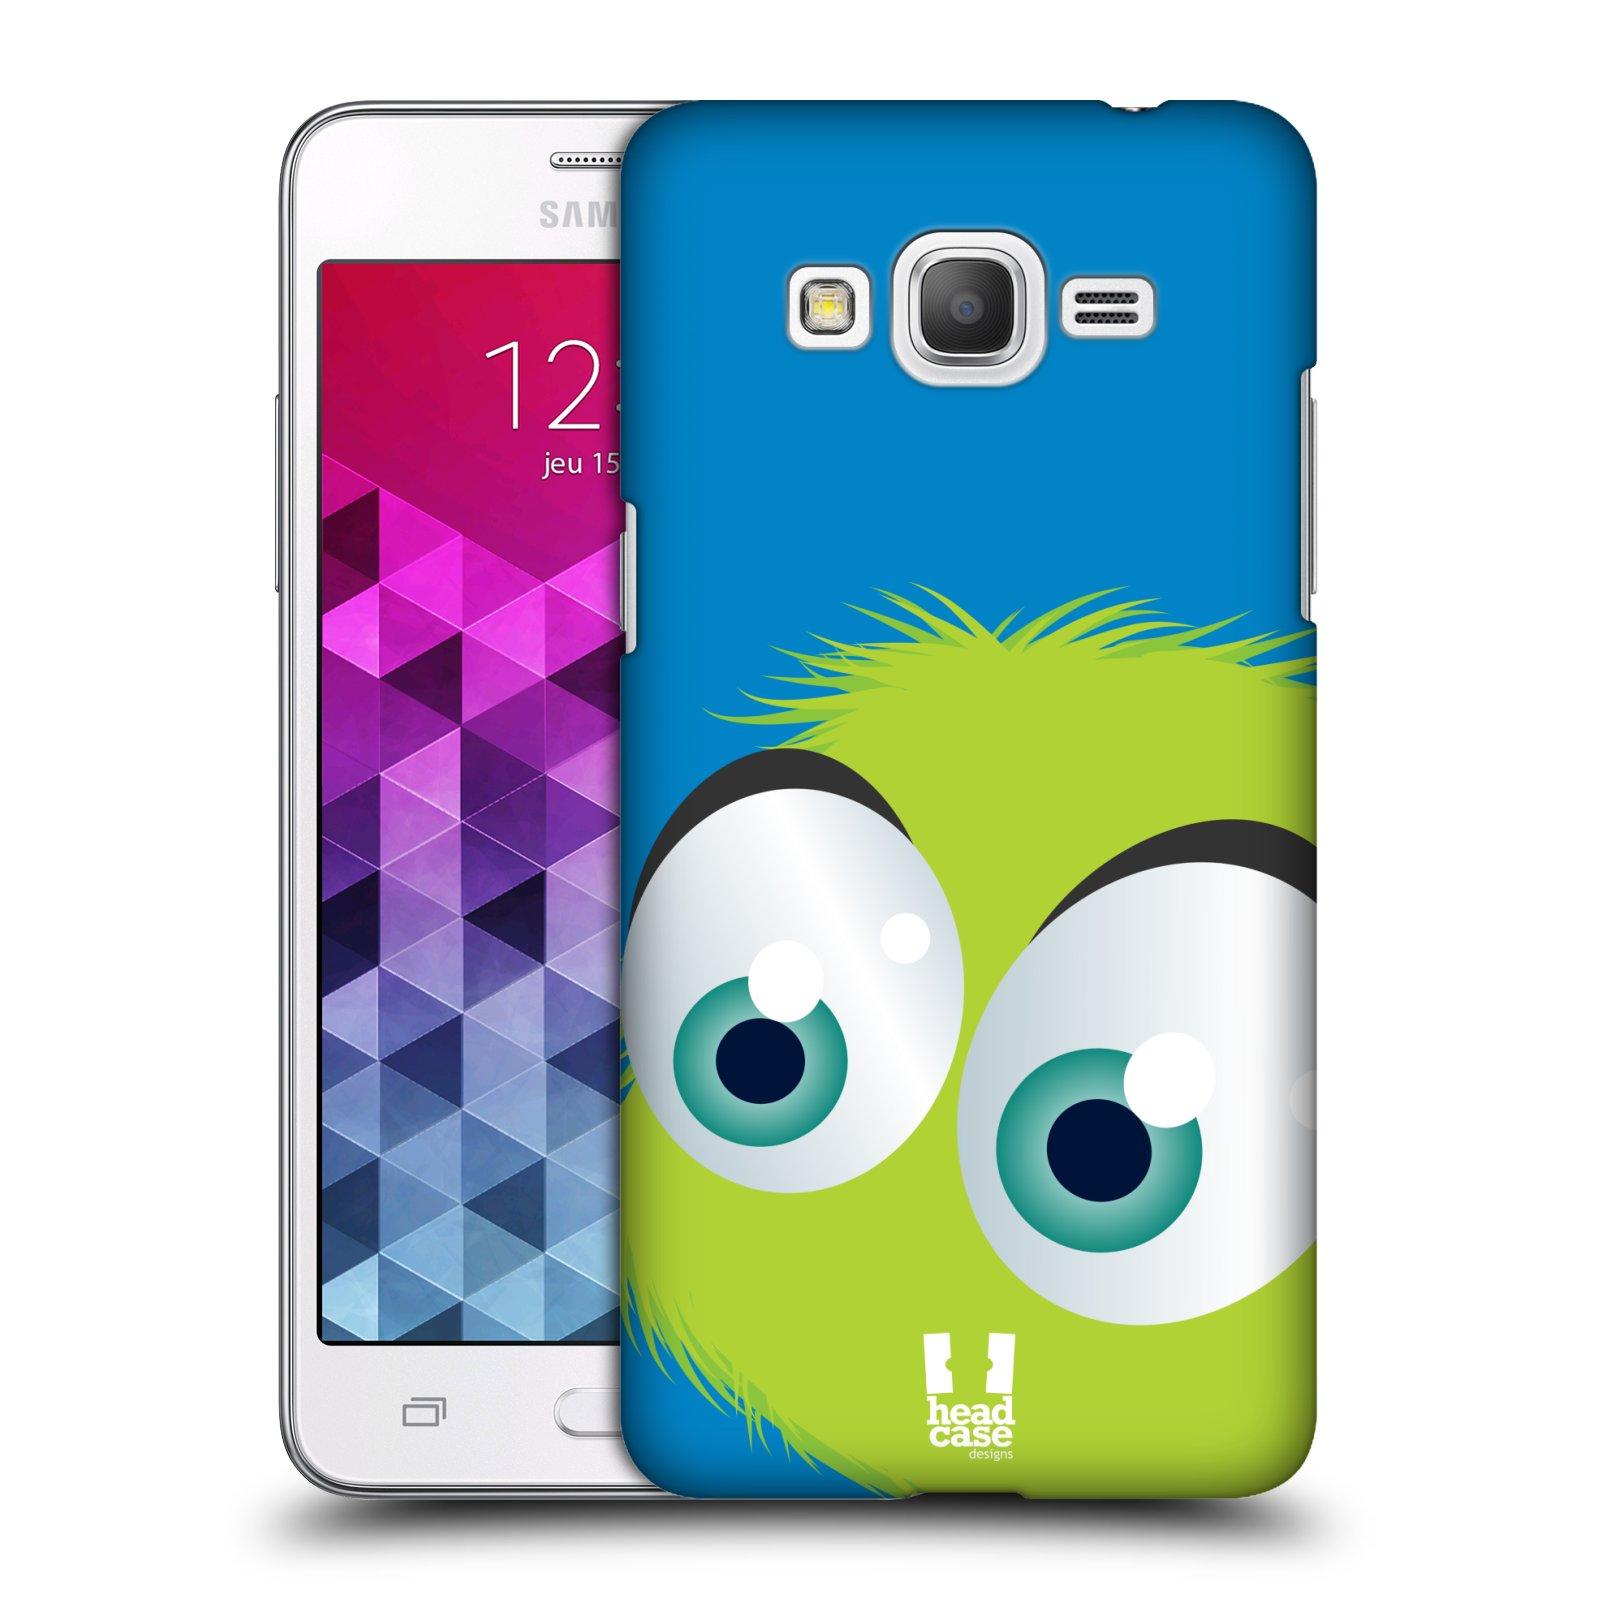 Plastové pouzdro na mobil Samsung Galaxy Grand Prime VE HEAD CASE FUZÍK ZELENÝ (Kryt či obal na mobilní telefon Samsung Galaxy Grand Prime VE SM-G531F)